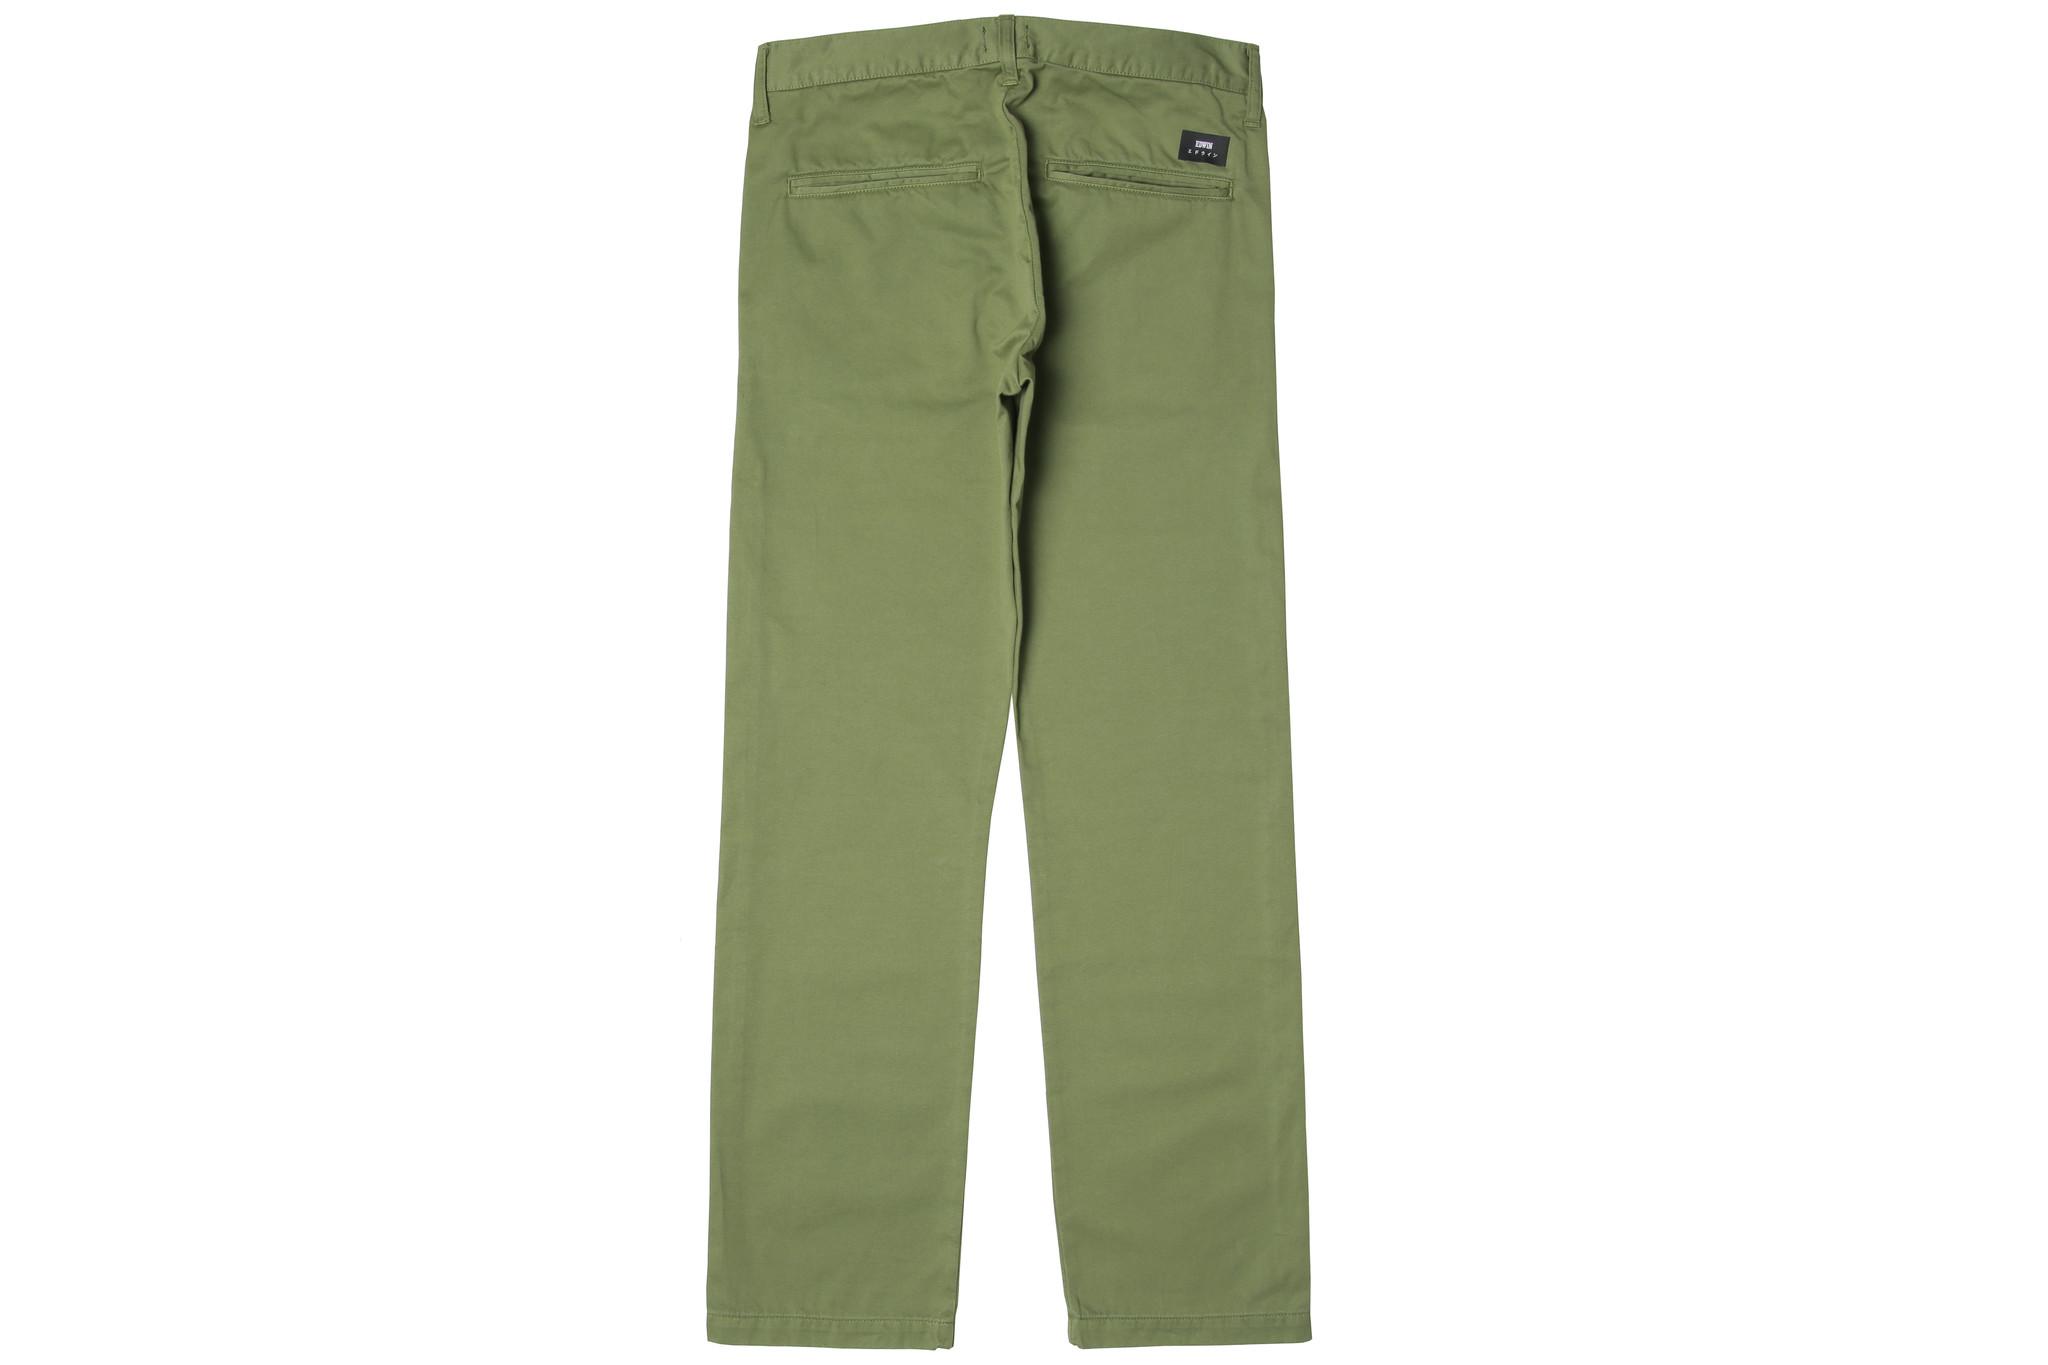 39 Chino PFD Olive Green Compact 9oz Twill-2